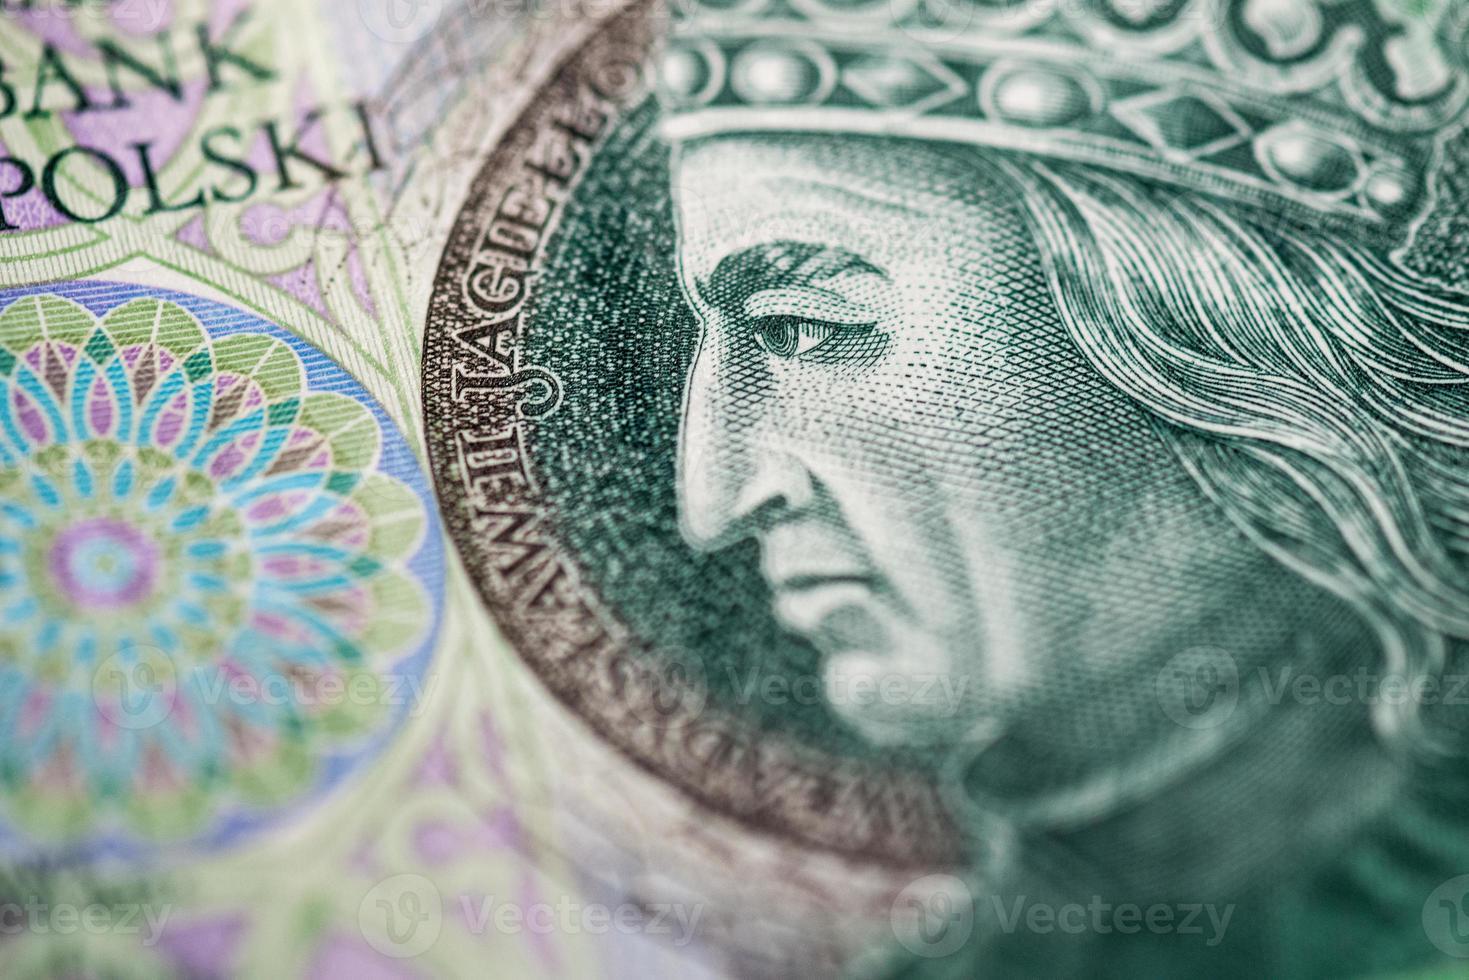 Polish paper money or banknotes photo